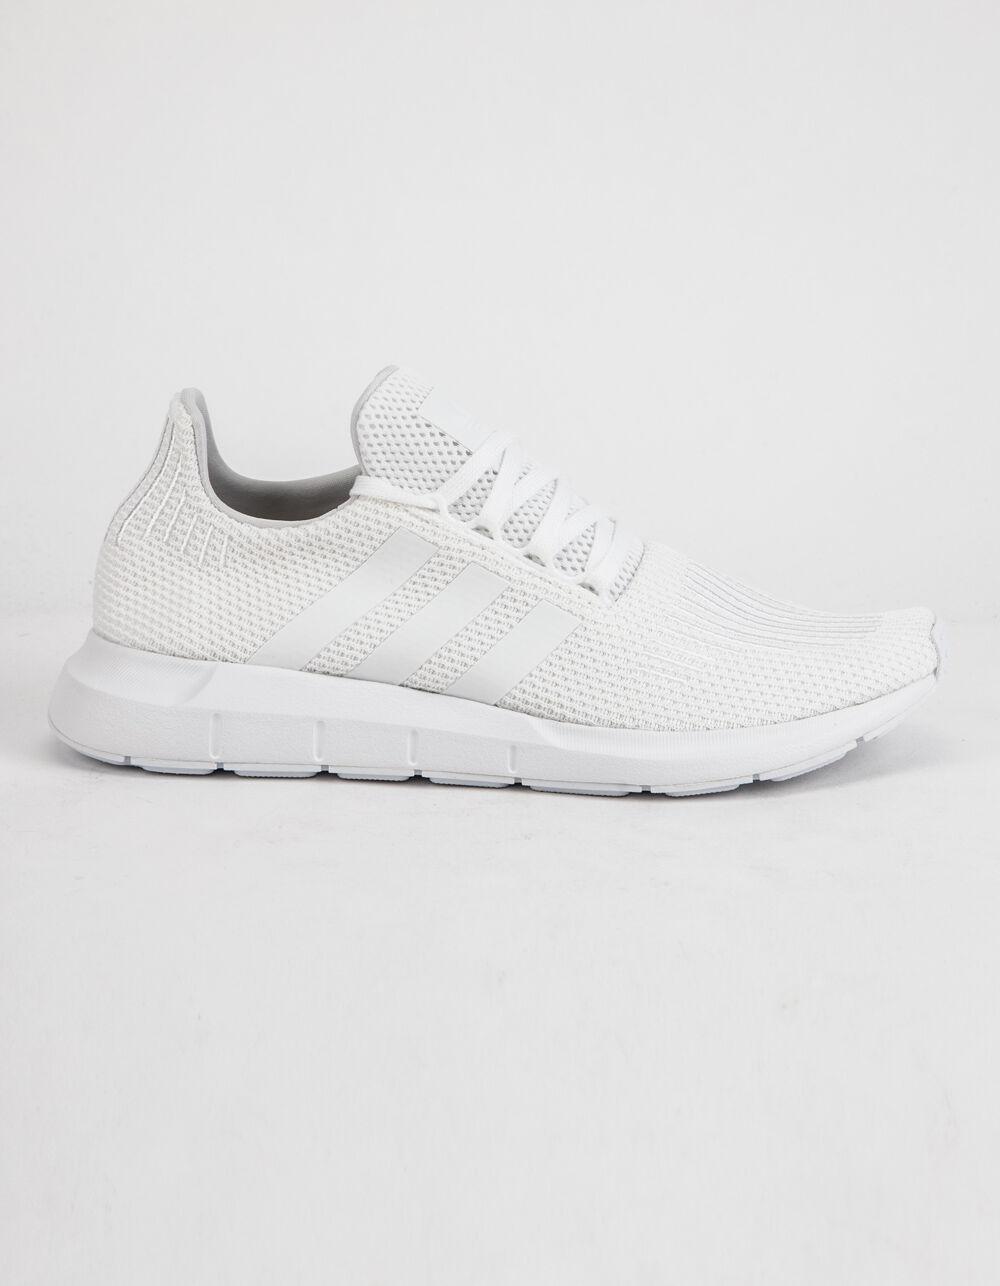 ADIDAS Swift Run White Shoes